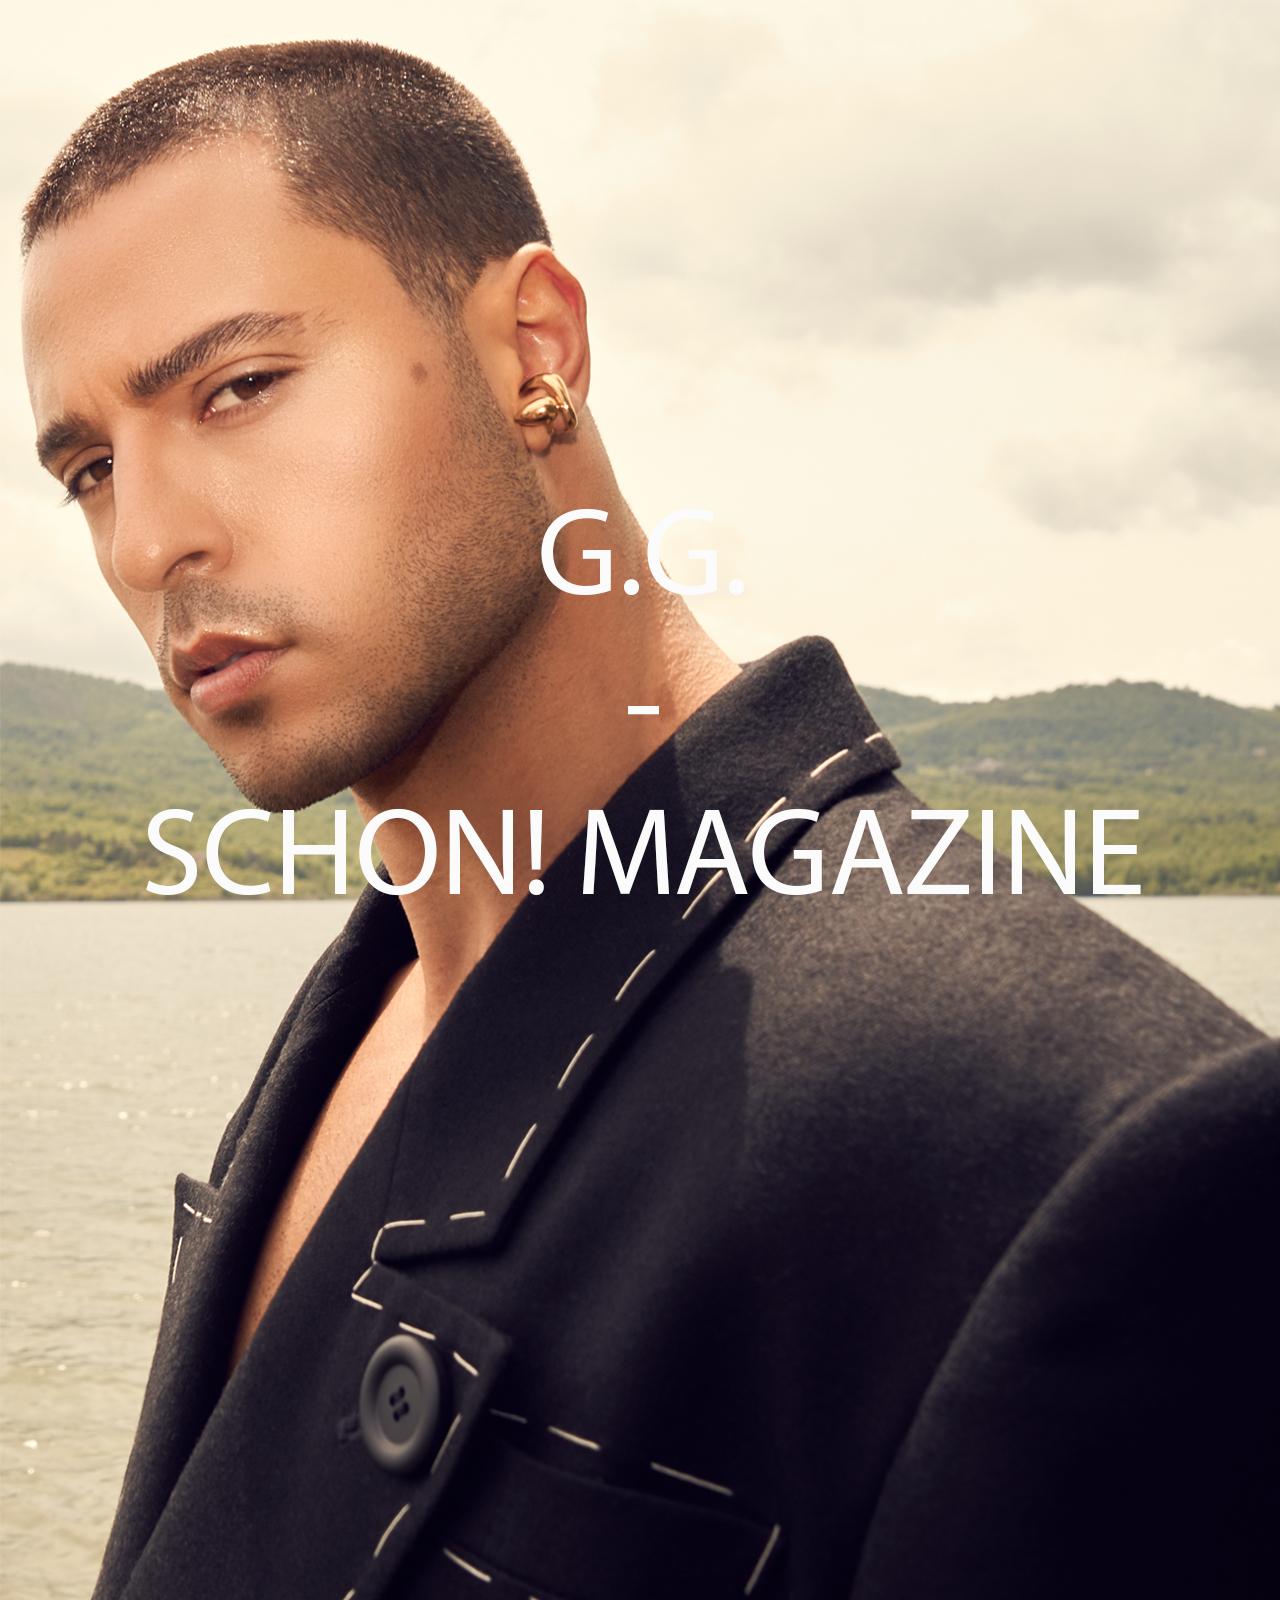 Giuseppe Giofrè - Andrea Reina - Schon Magazine